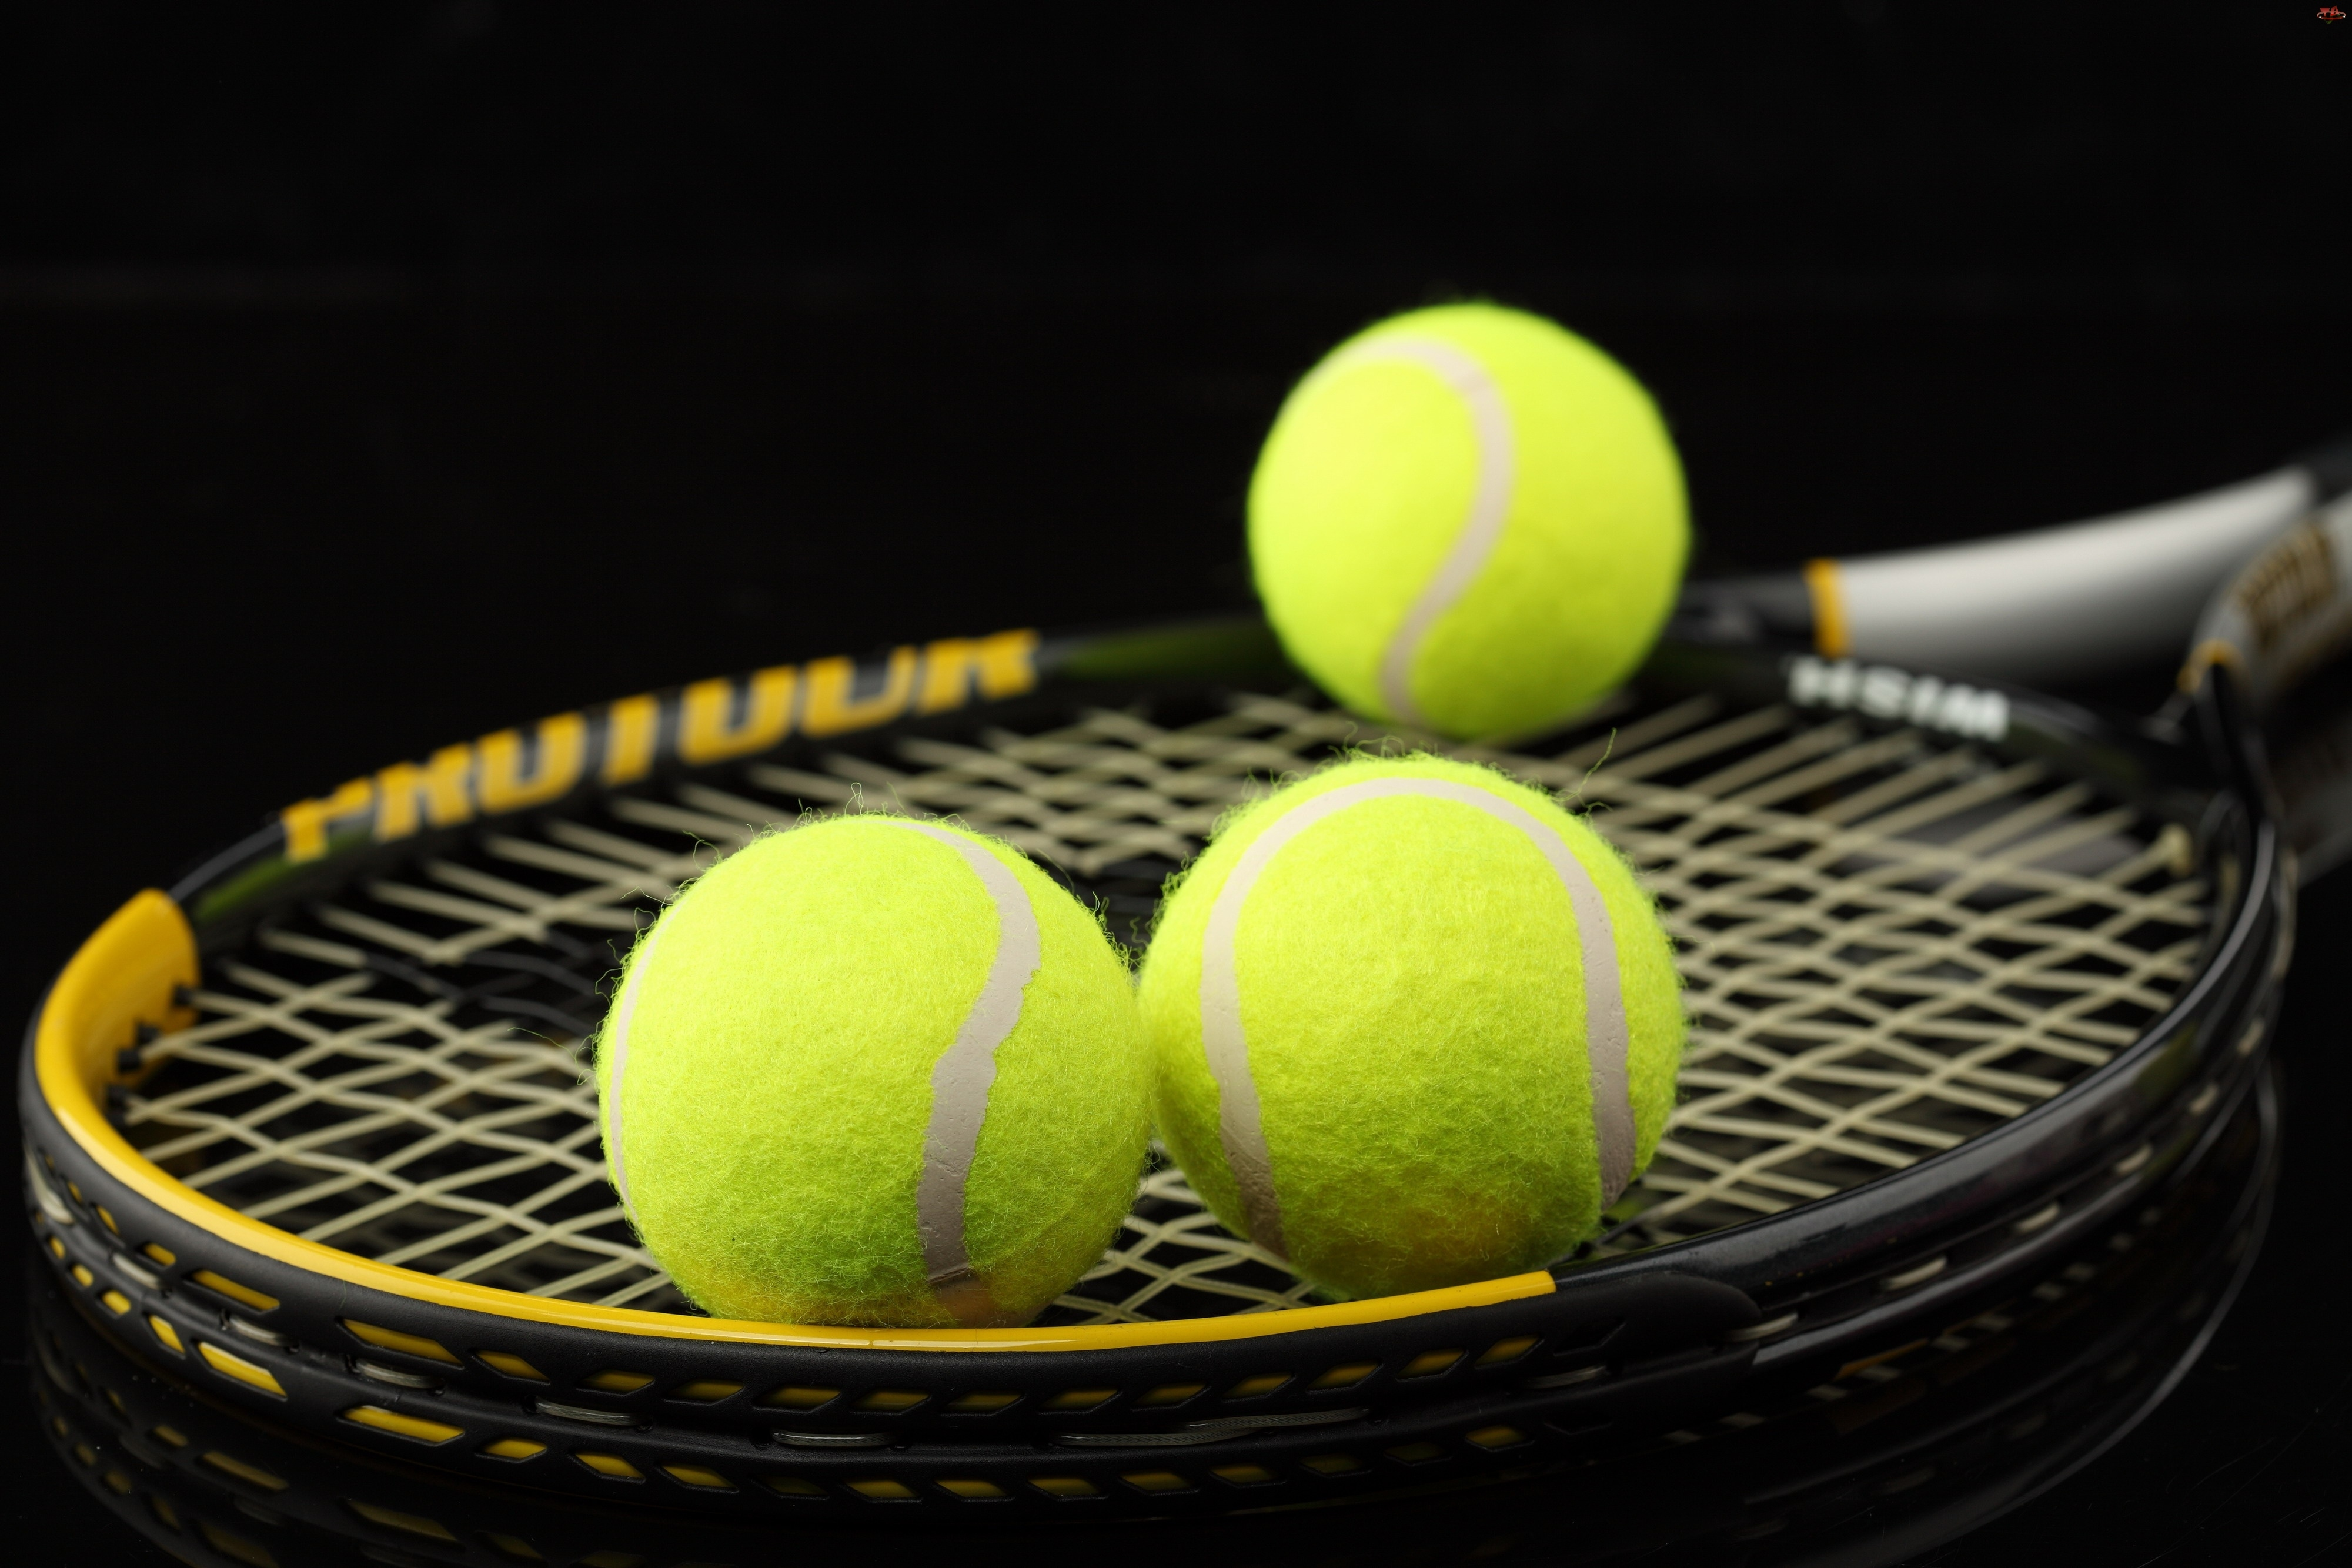 Tenis, Rakieta, Piłeczki